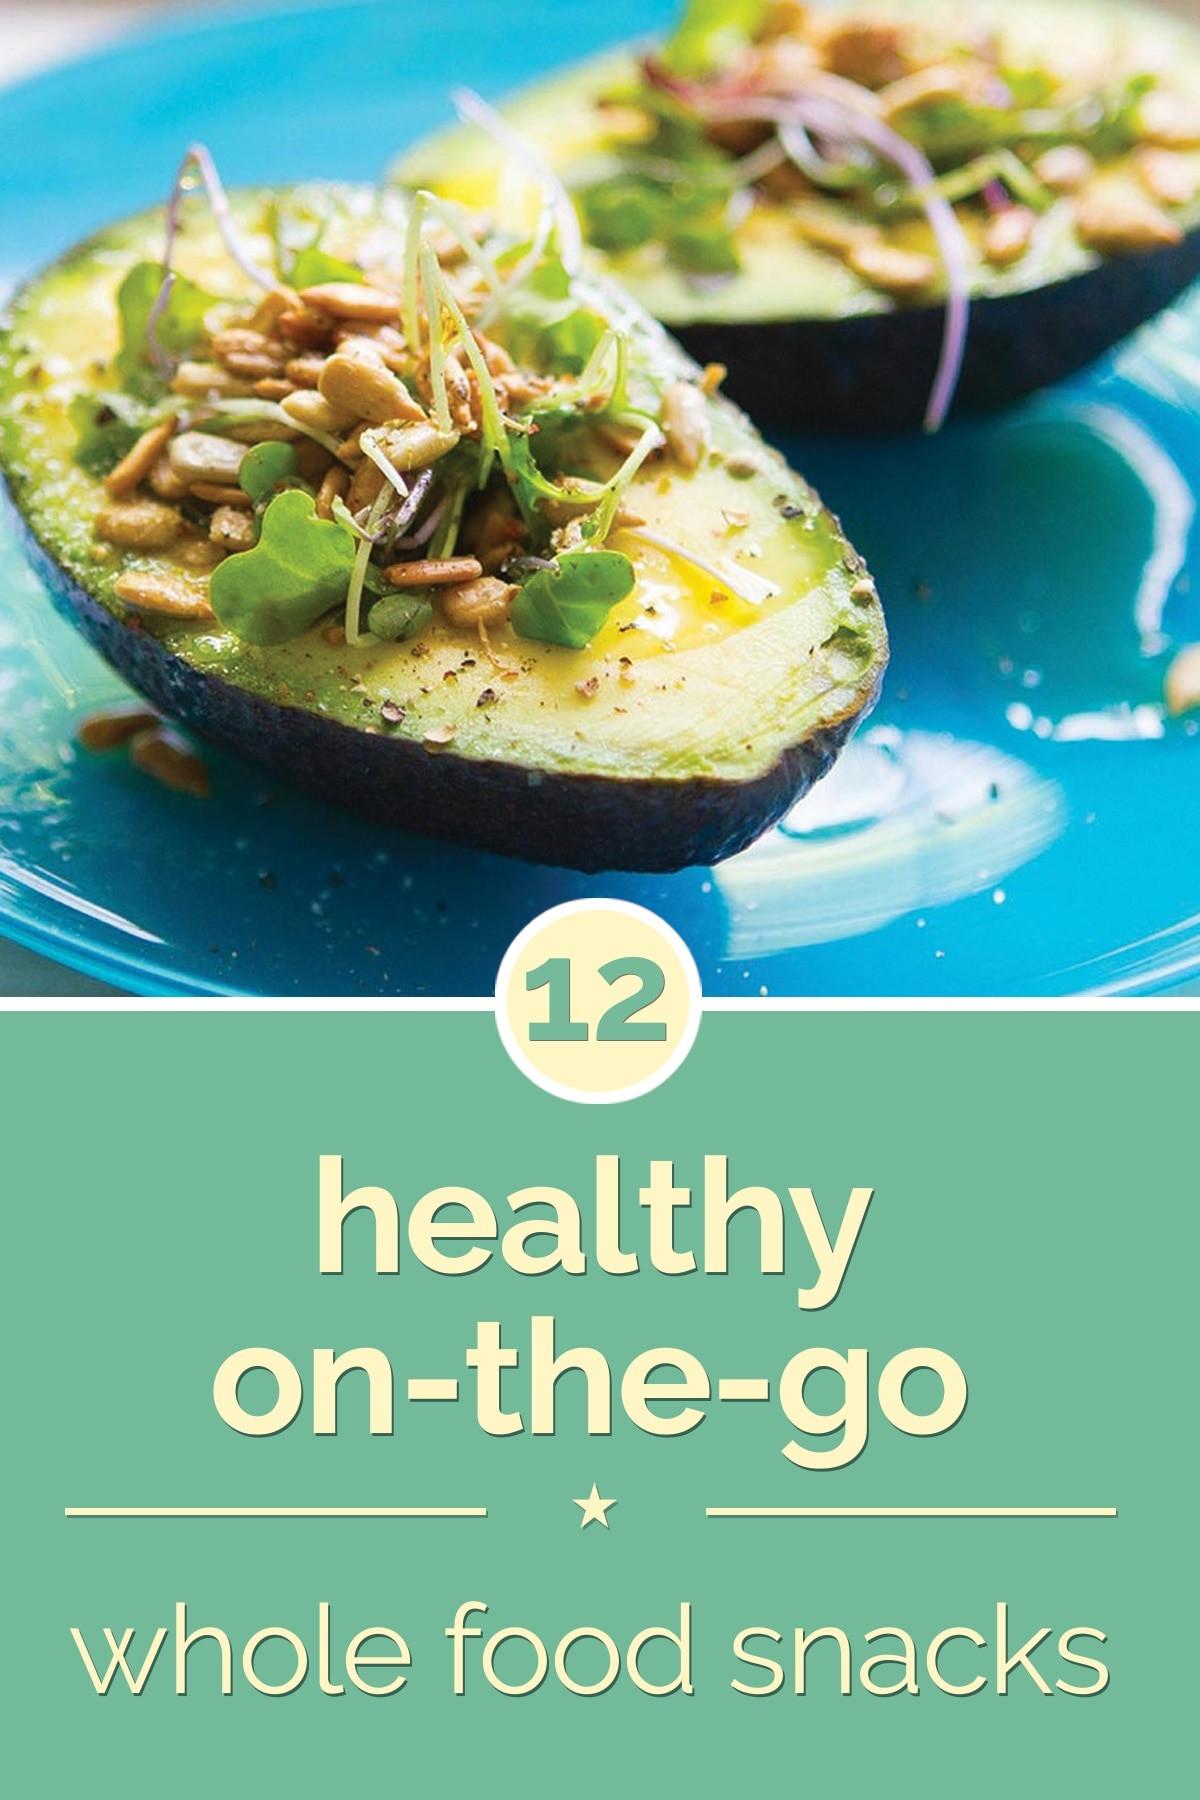 Healthy Snacks On The Go  12 Healthy the Go Whole Food Snacks thegoodstuff